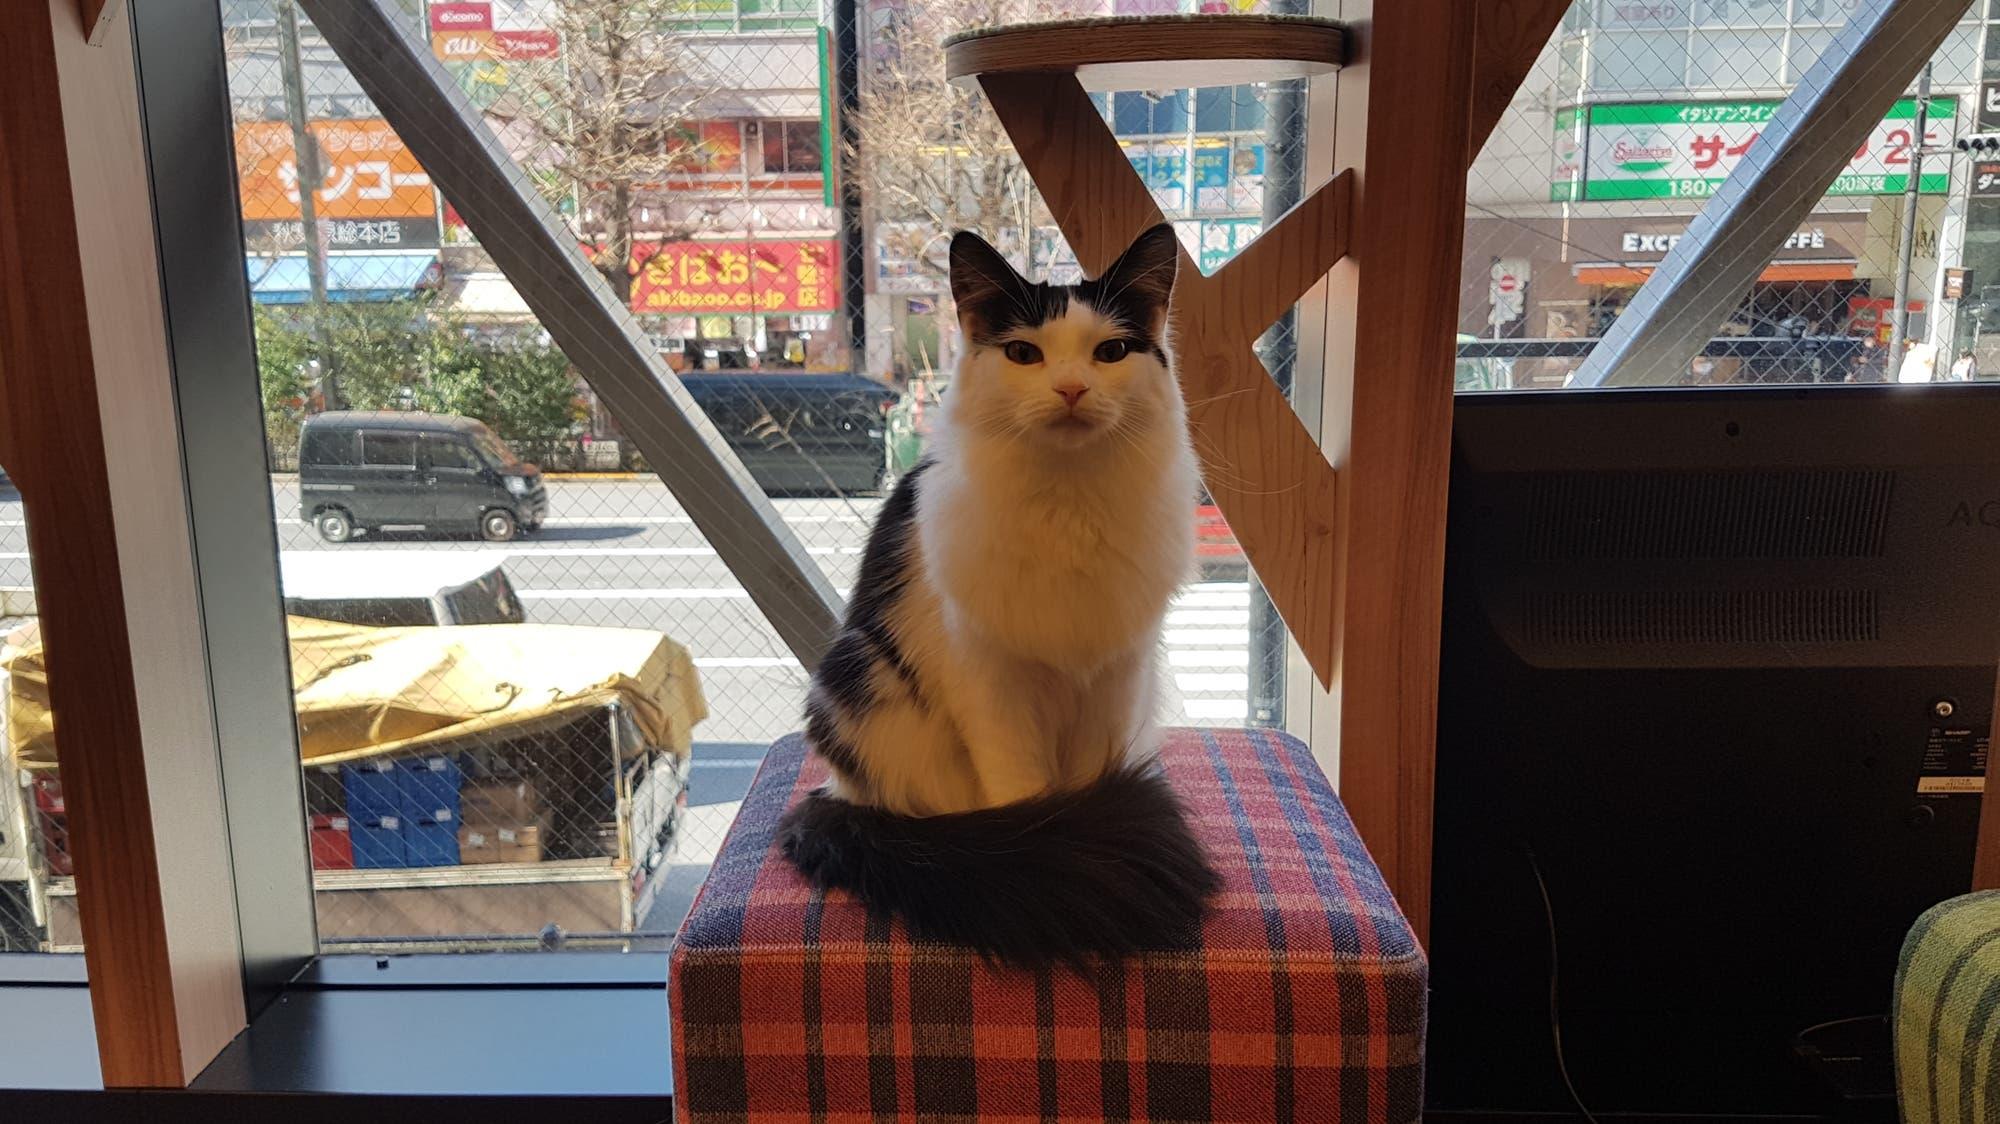 Neko café, el curioso lugar para pasar un rato con gatos en Japón